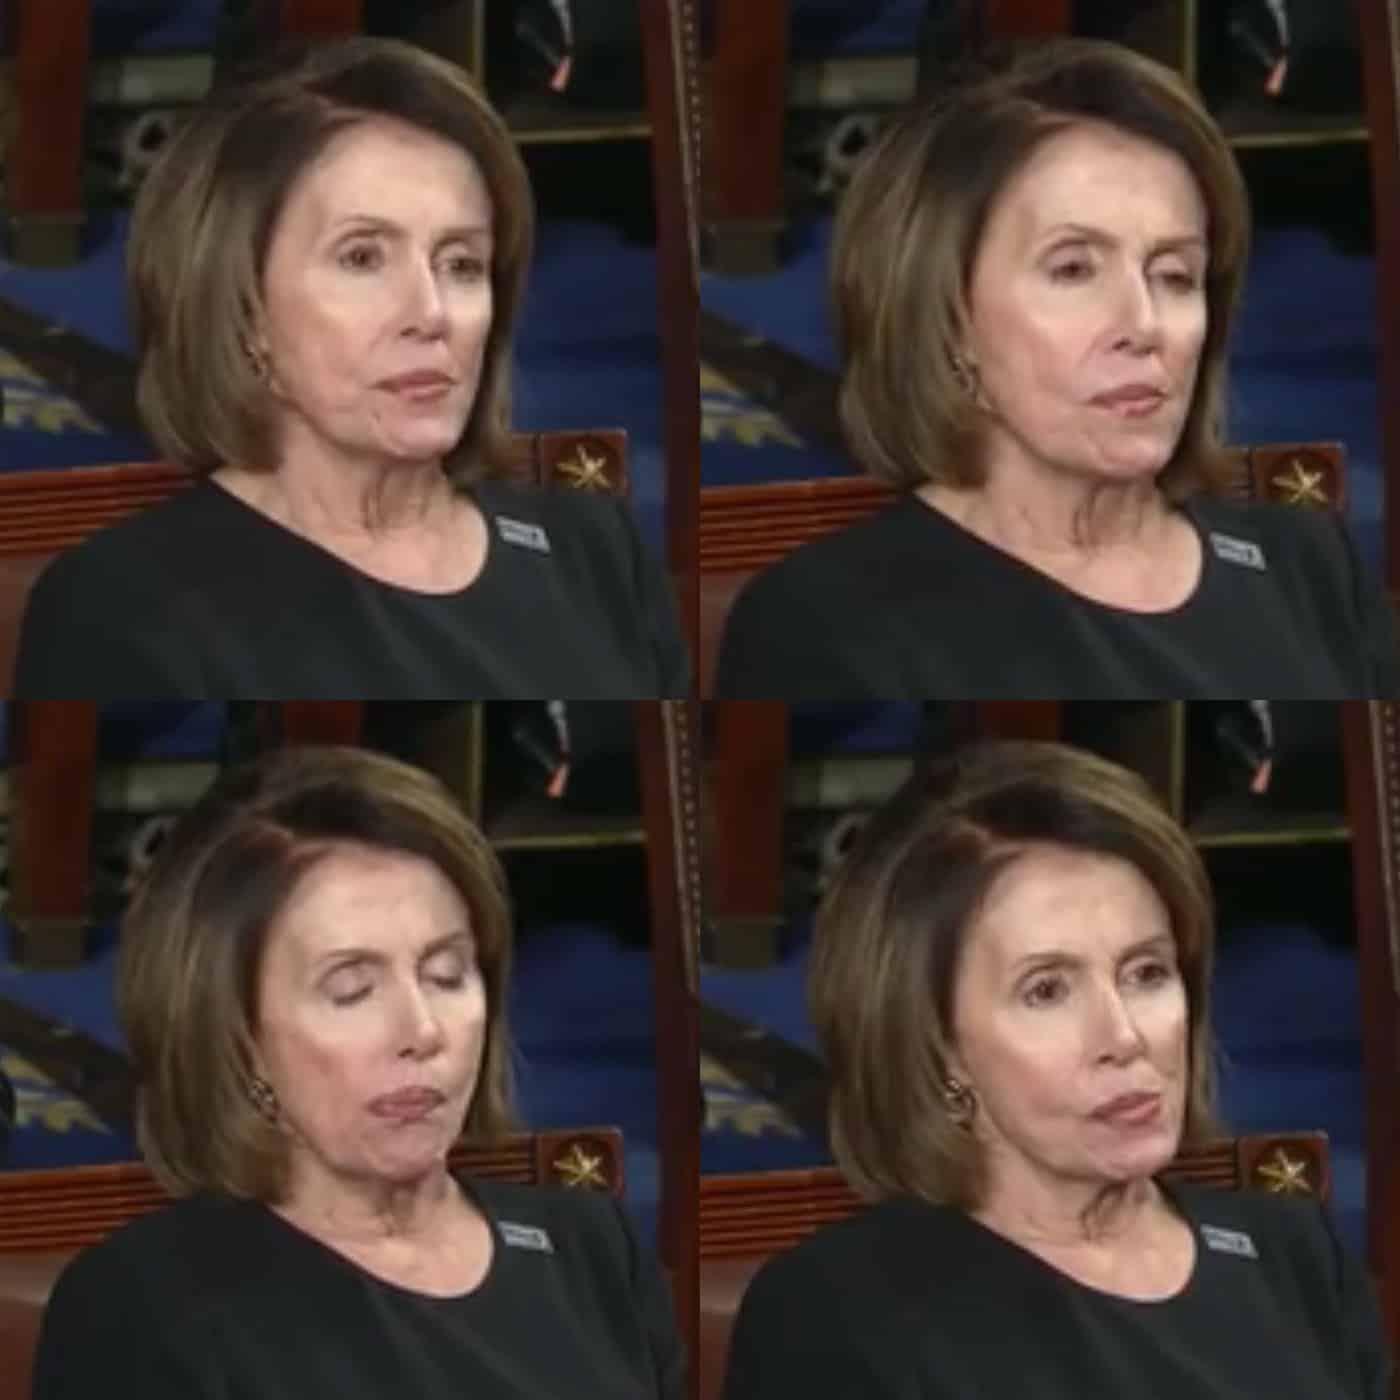 Nancy Pelosi - Democrats Incredulous at Donald Trump